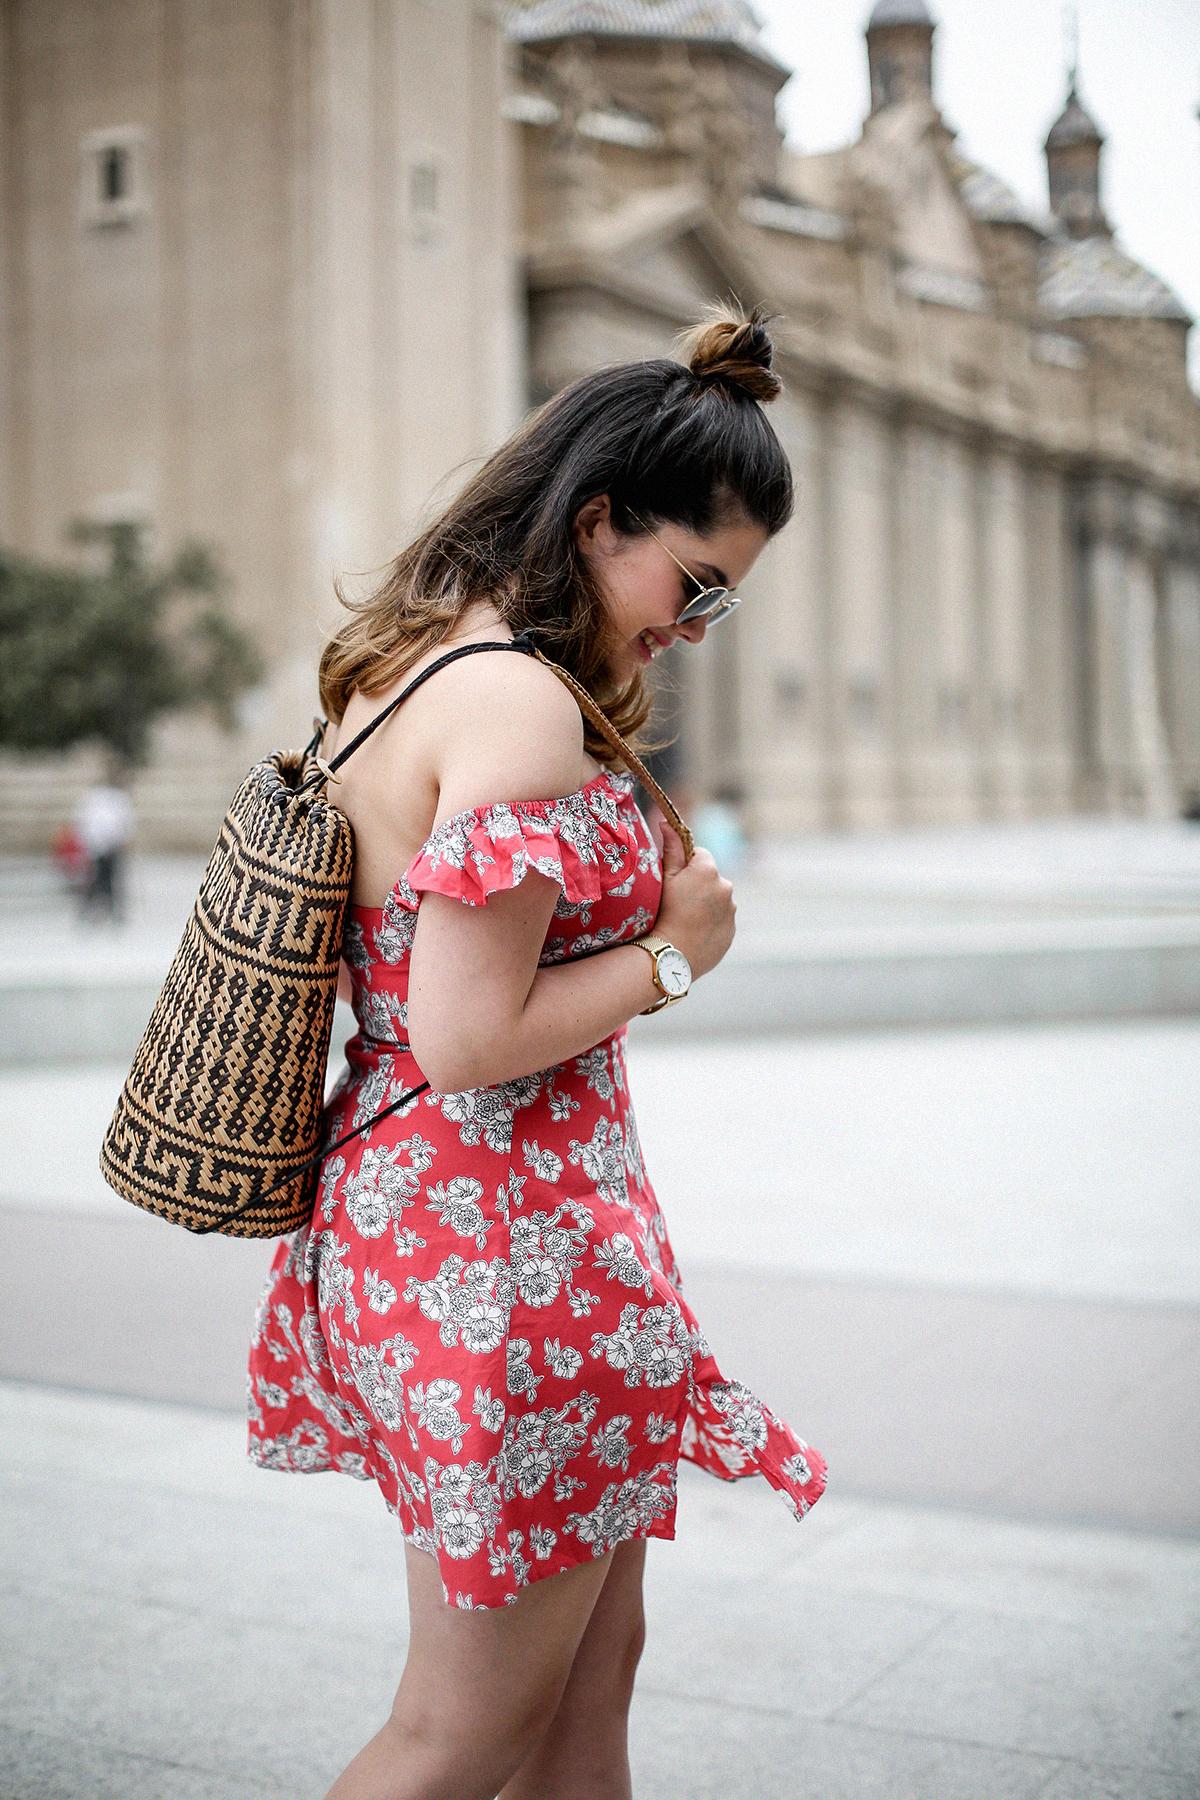 vestido-hombros-al-aire-asos-mochila-ratan-zaragoza-travel3